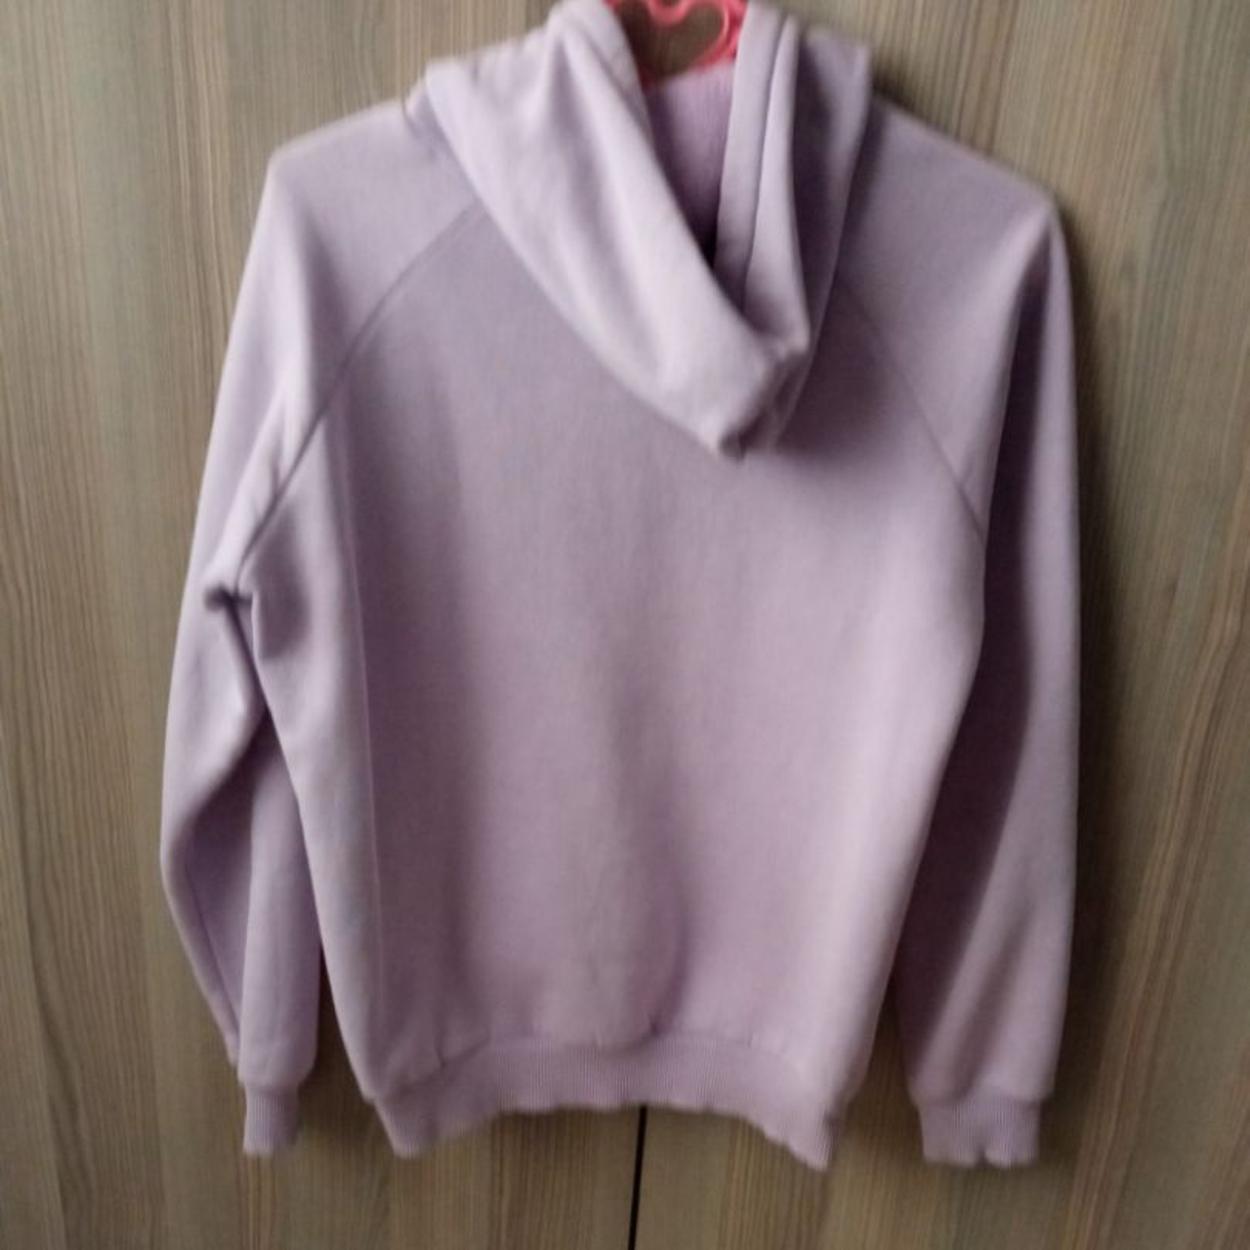 Vitrin Sweatshirt